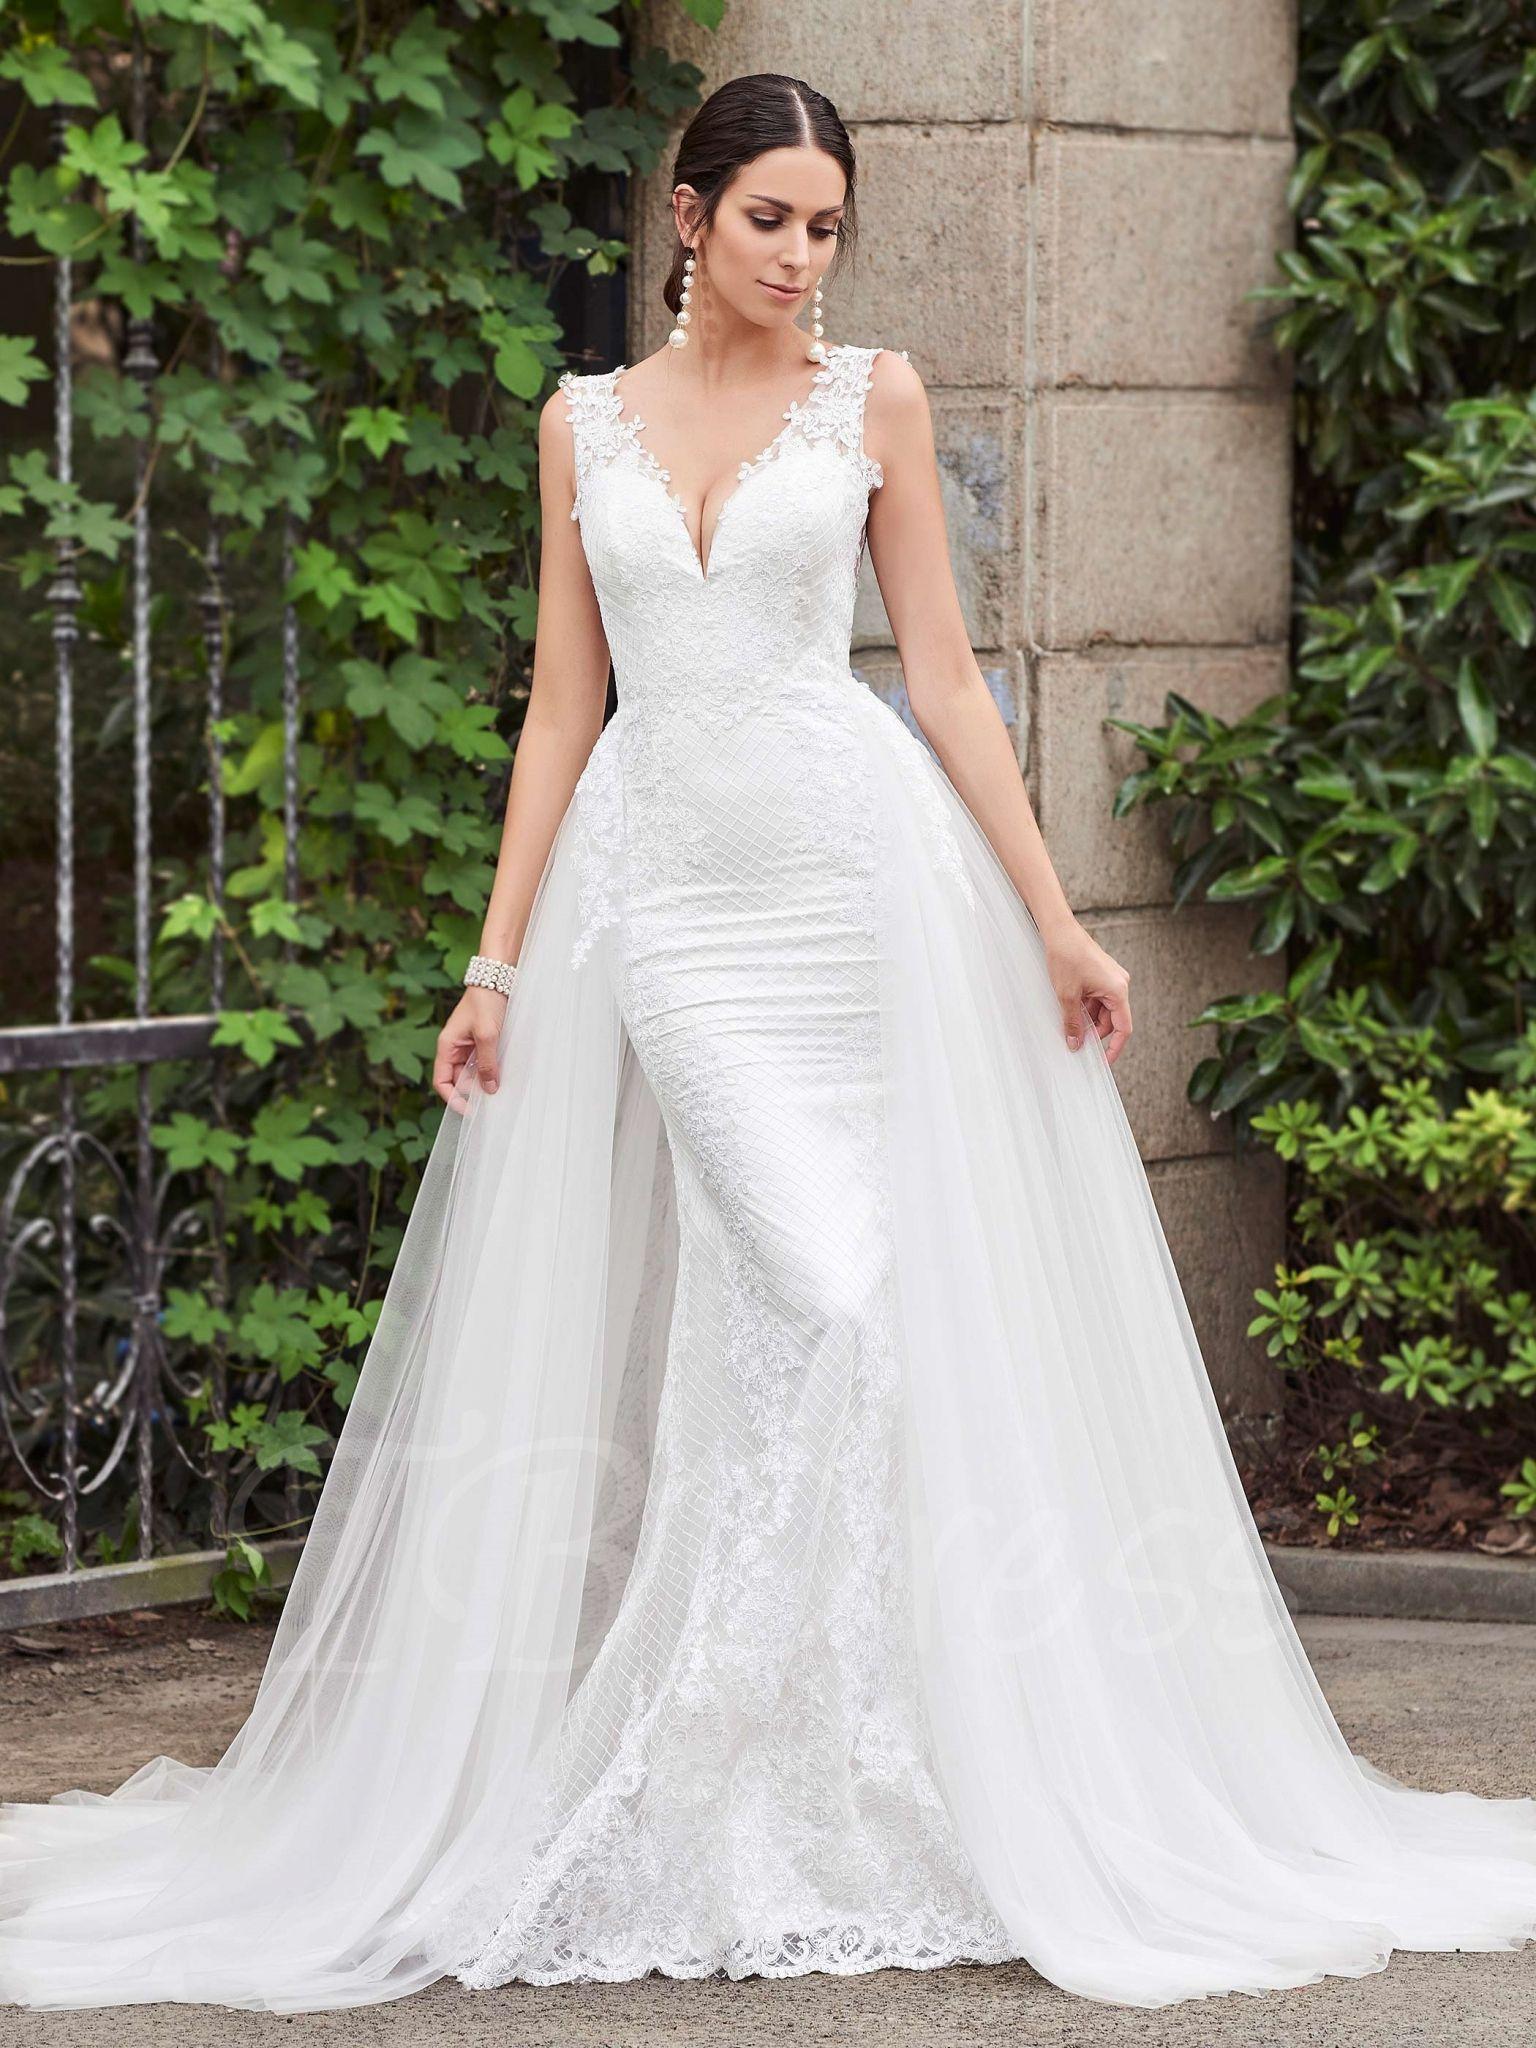 Wedding Dress Outlet Online - Best Shapewear for Wedding Dress Check ...